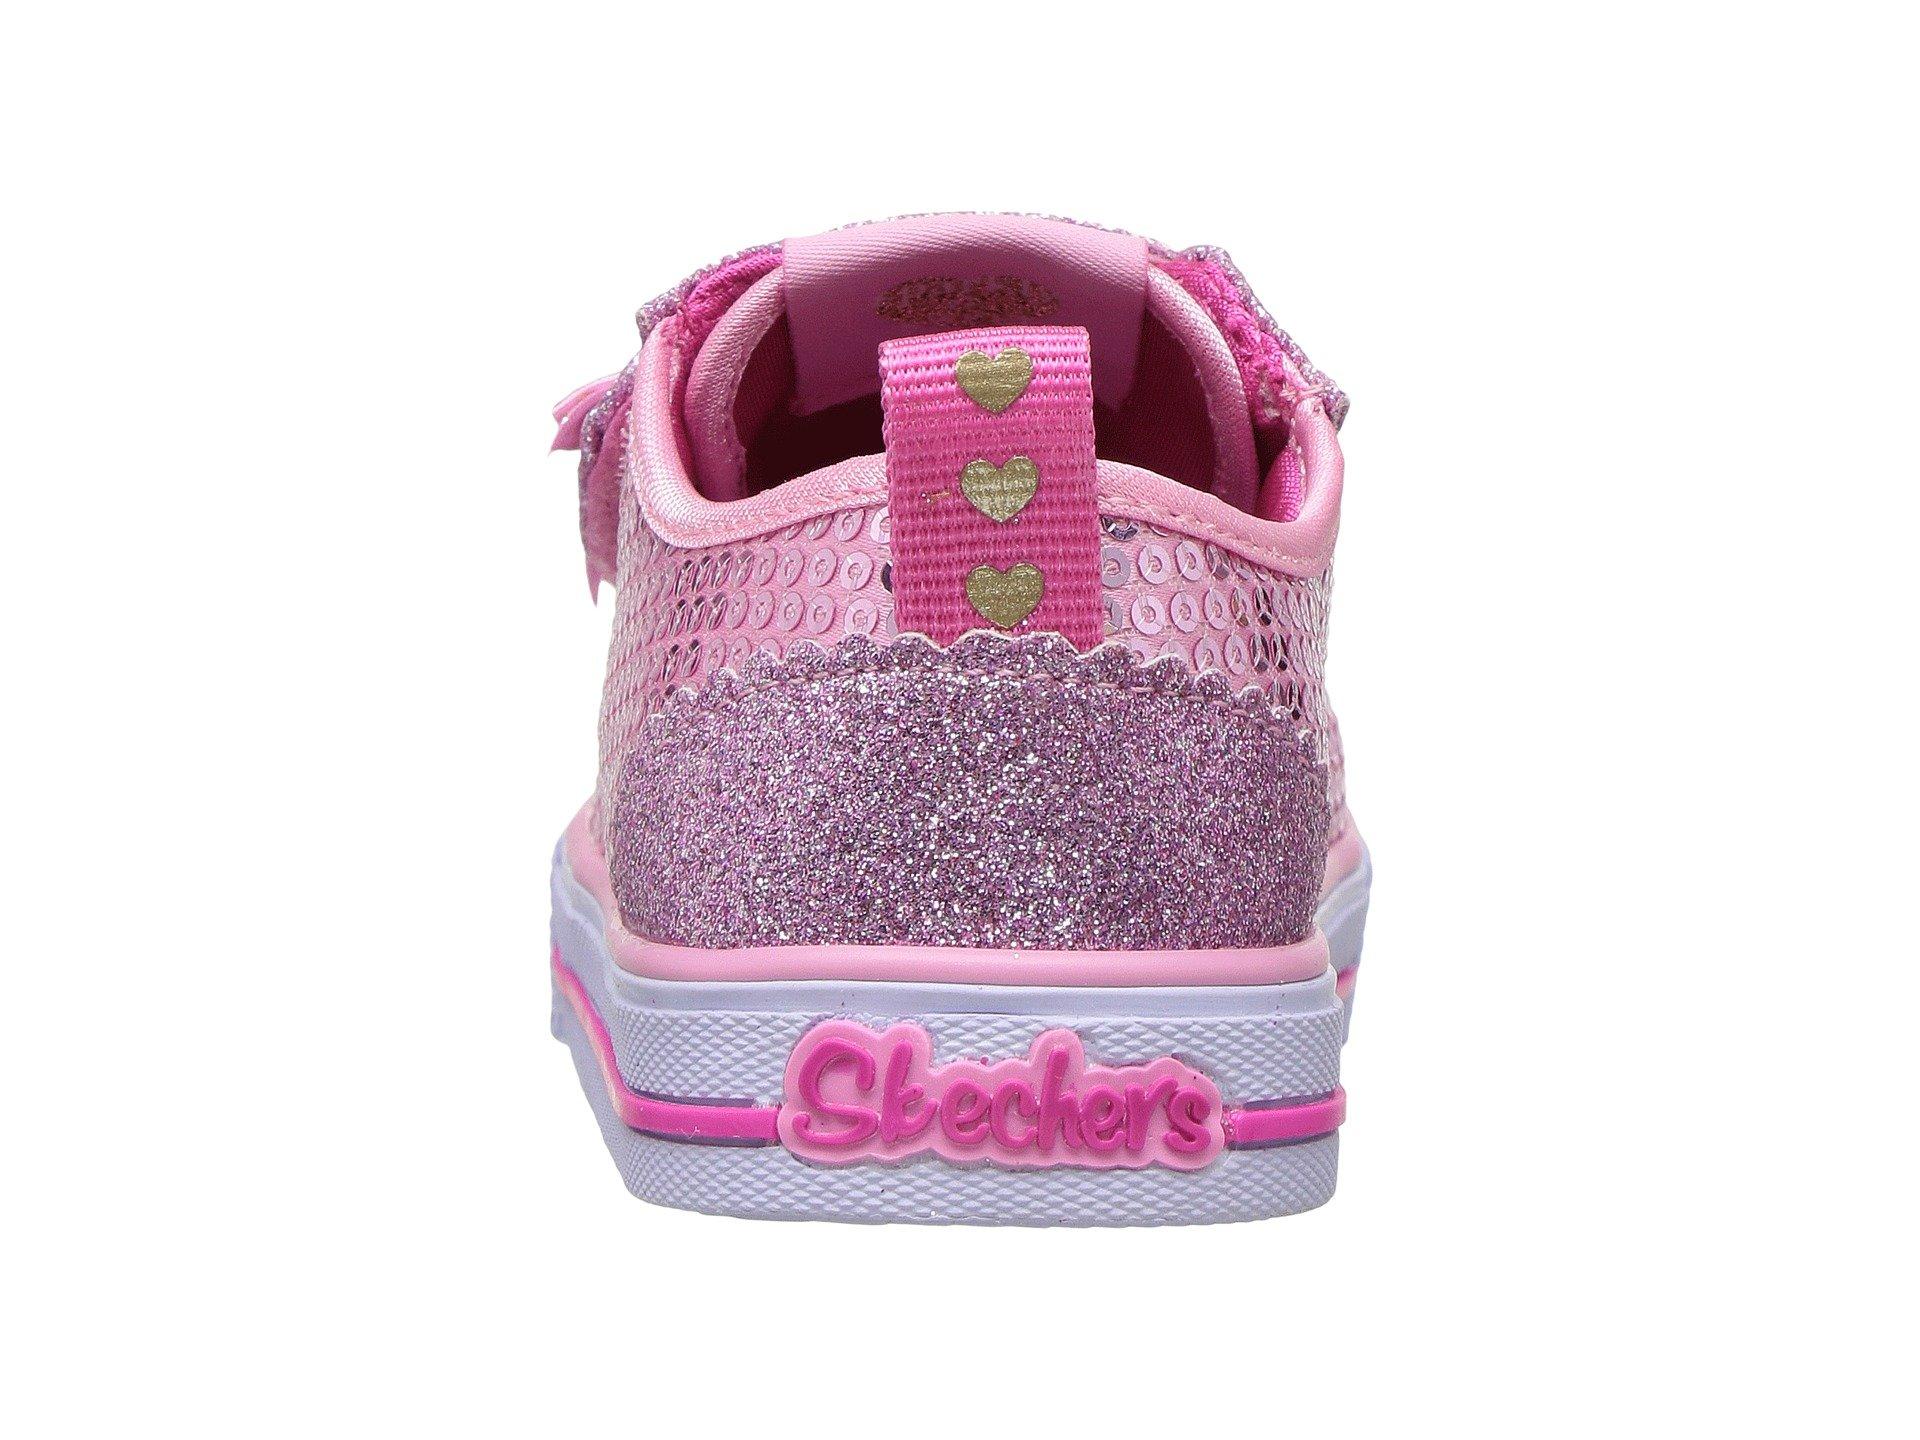 Itsy Bitsy Brand Shoes